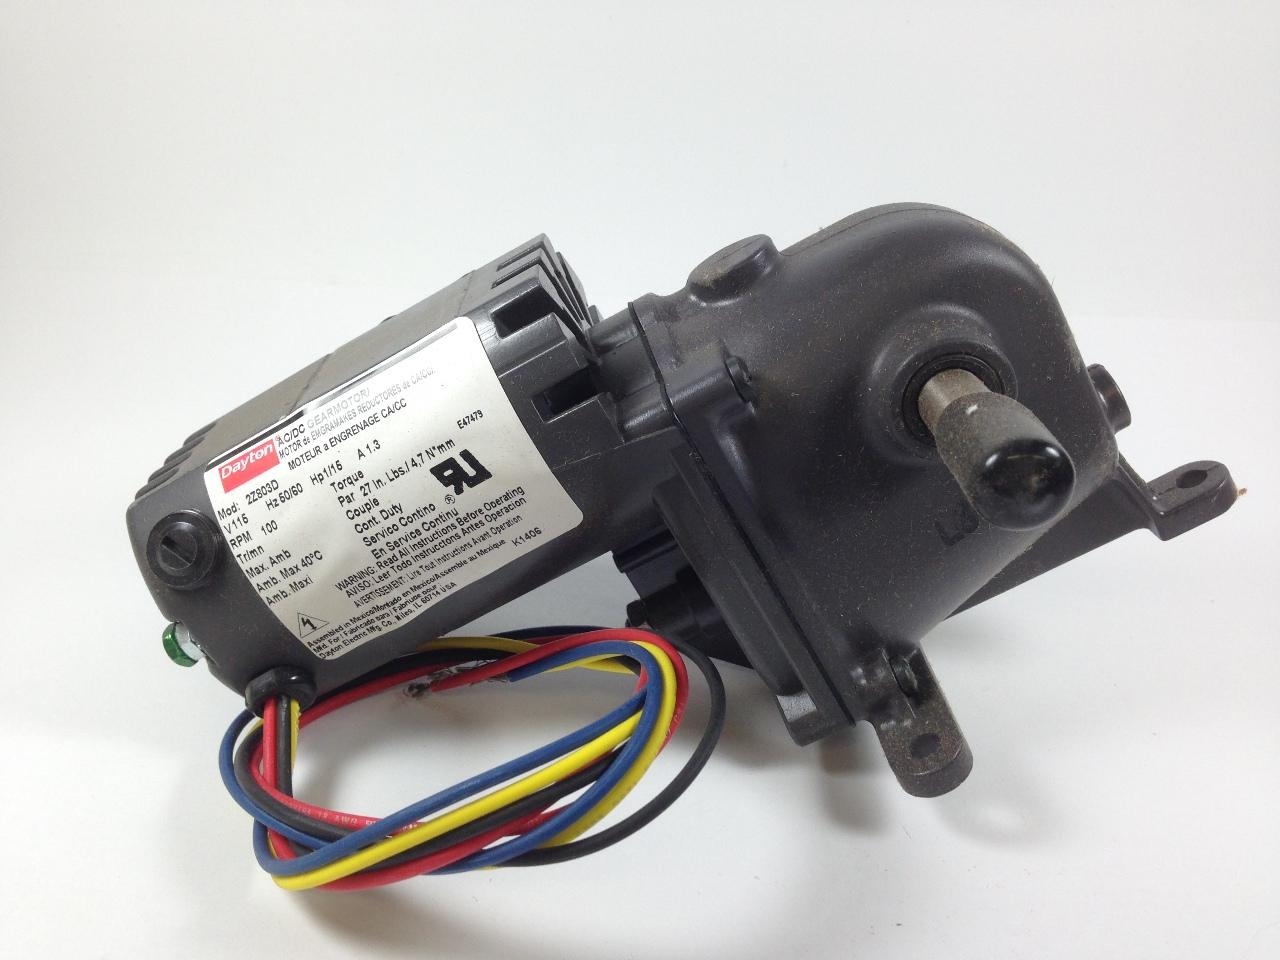 Dayton Ac Dc Gear Motordayton 12 Volt Right Angle Motor 1 Electric Wiring Diagram Am A Cutler Hammer Db1 Electrical Lotastock